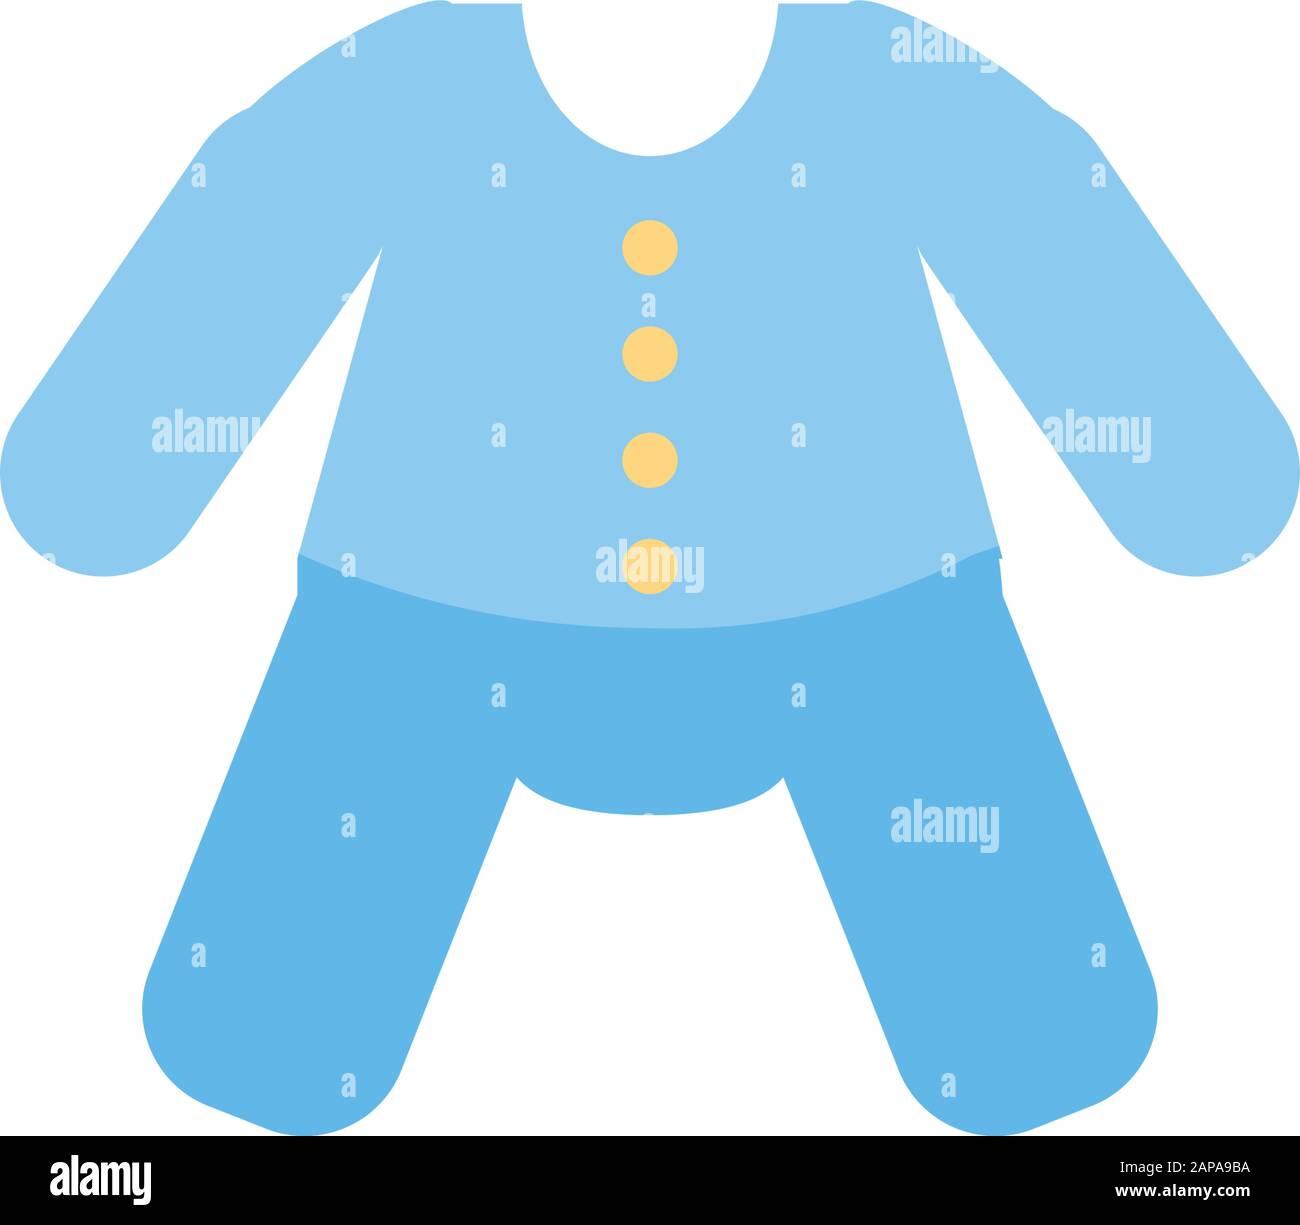 baby cloth design, Child newborn childhood object innocence and little theme Vector illustration Stock Vector